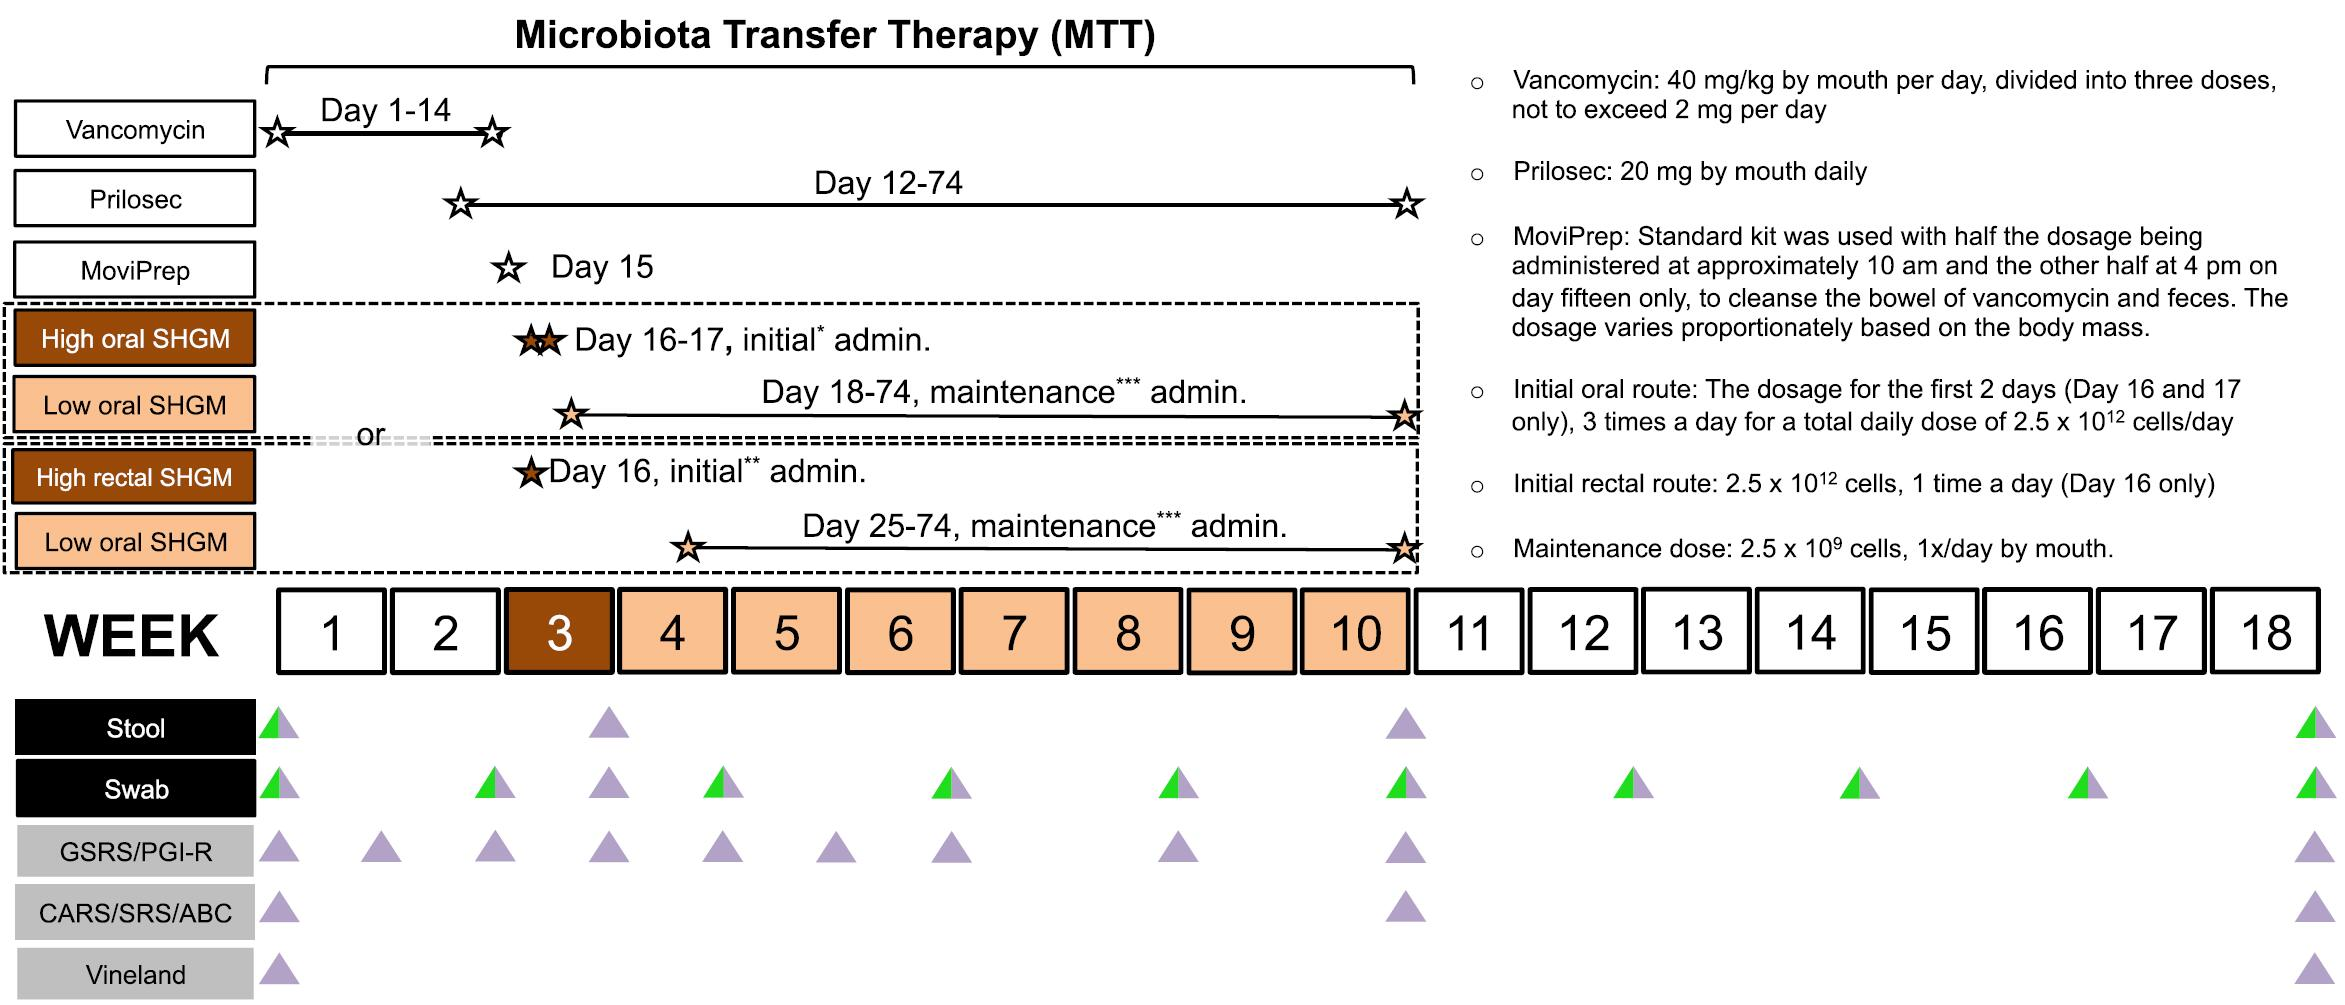 QIIME 2 User Documentation  5 Fecal microbiota transplant